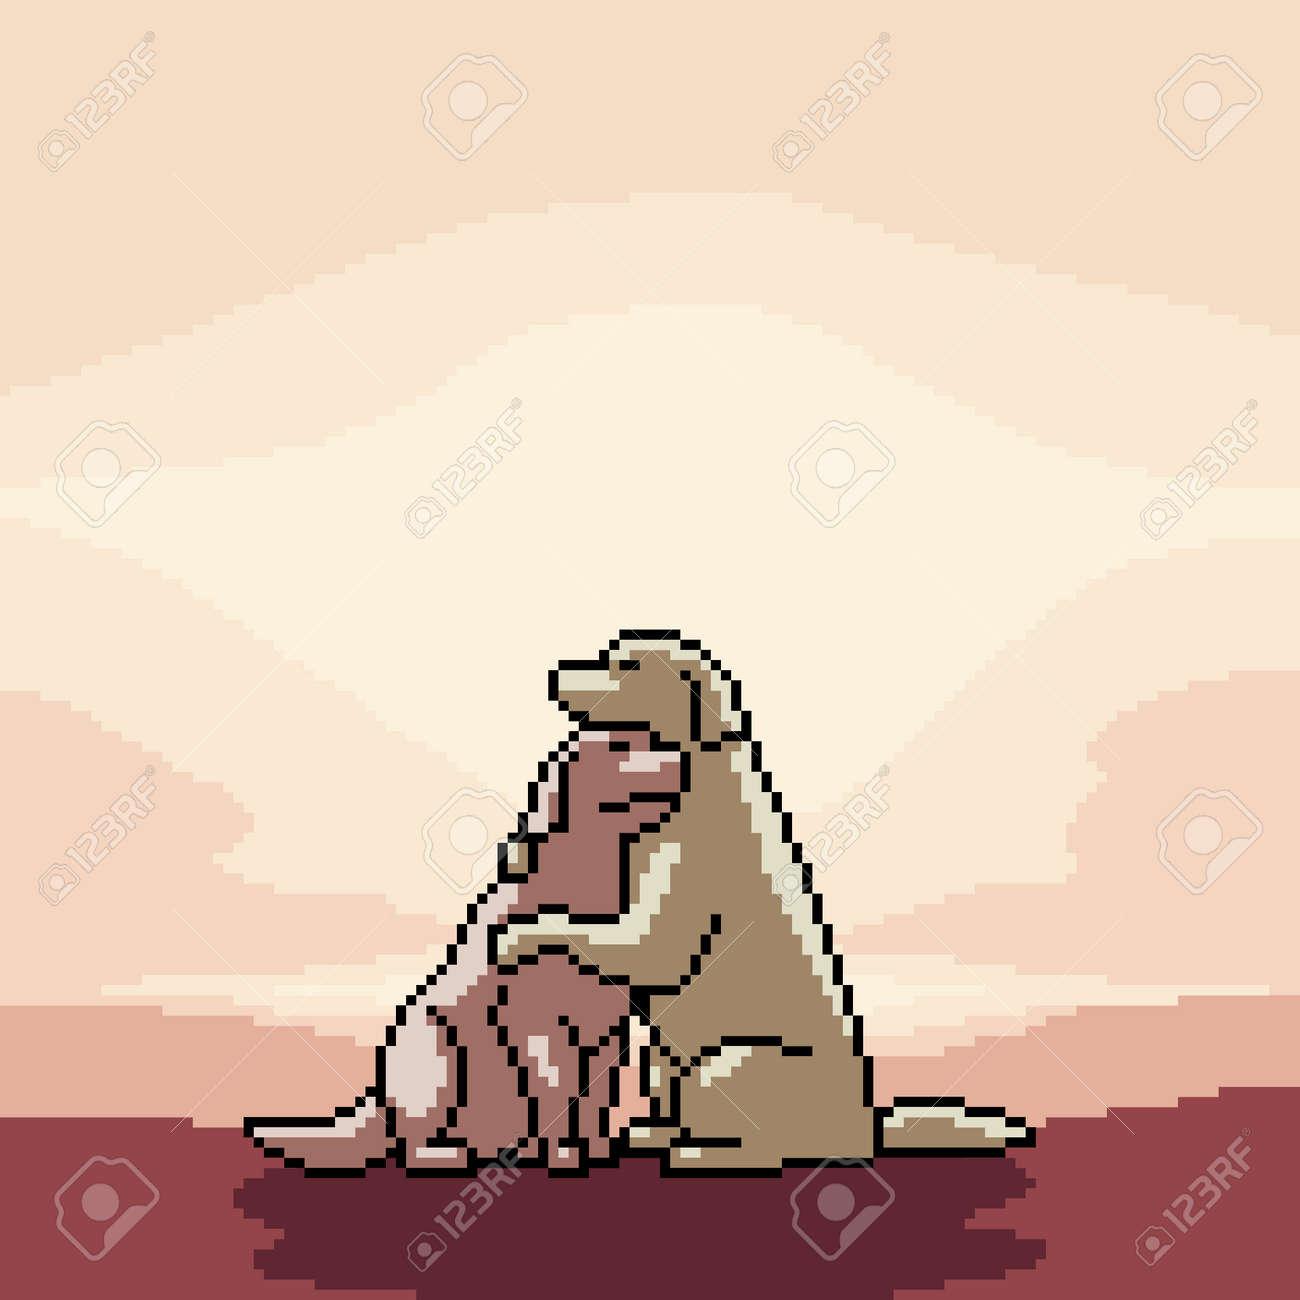 pixel art of romance dogs couple - 167375147